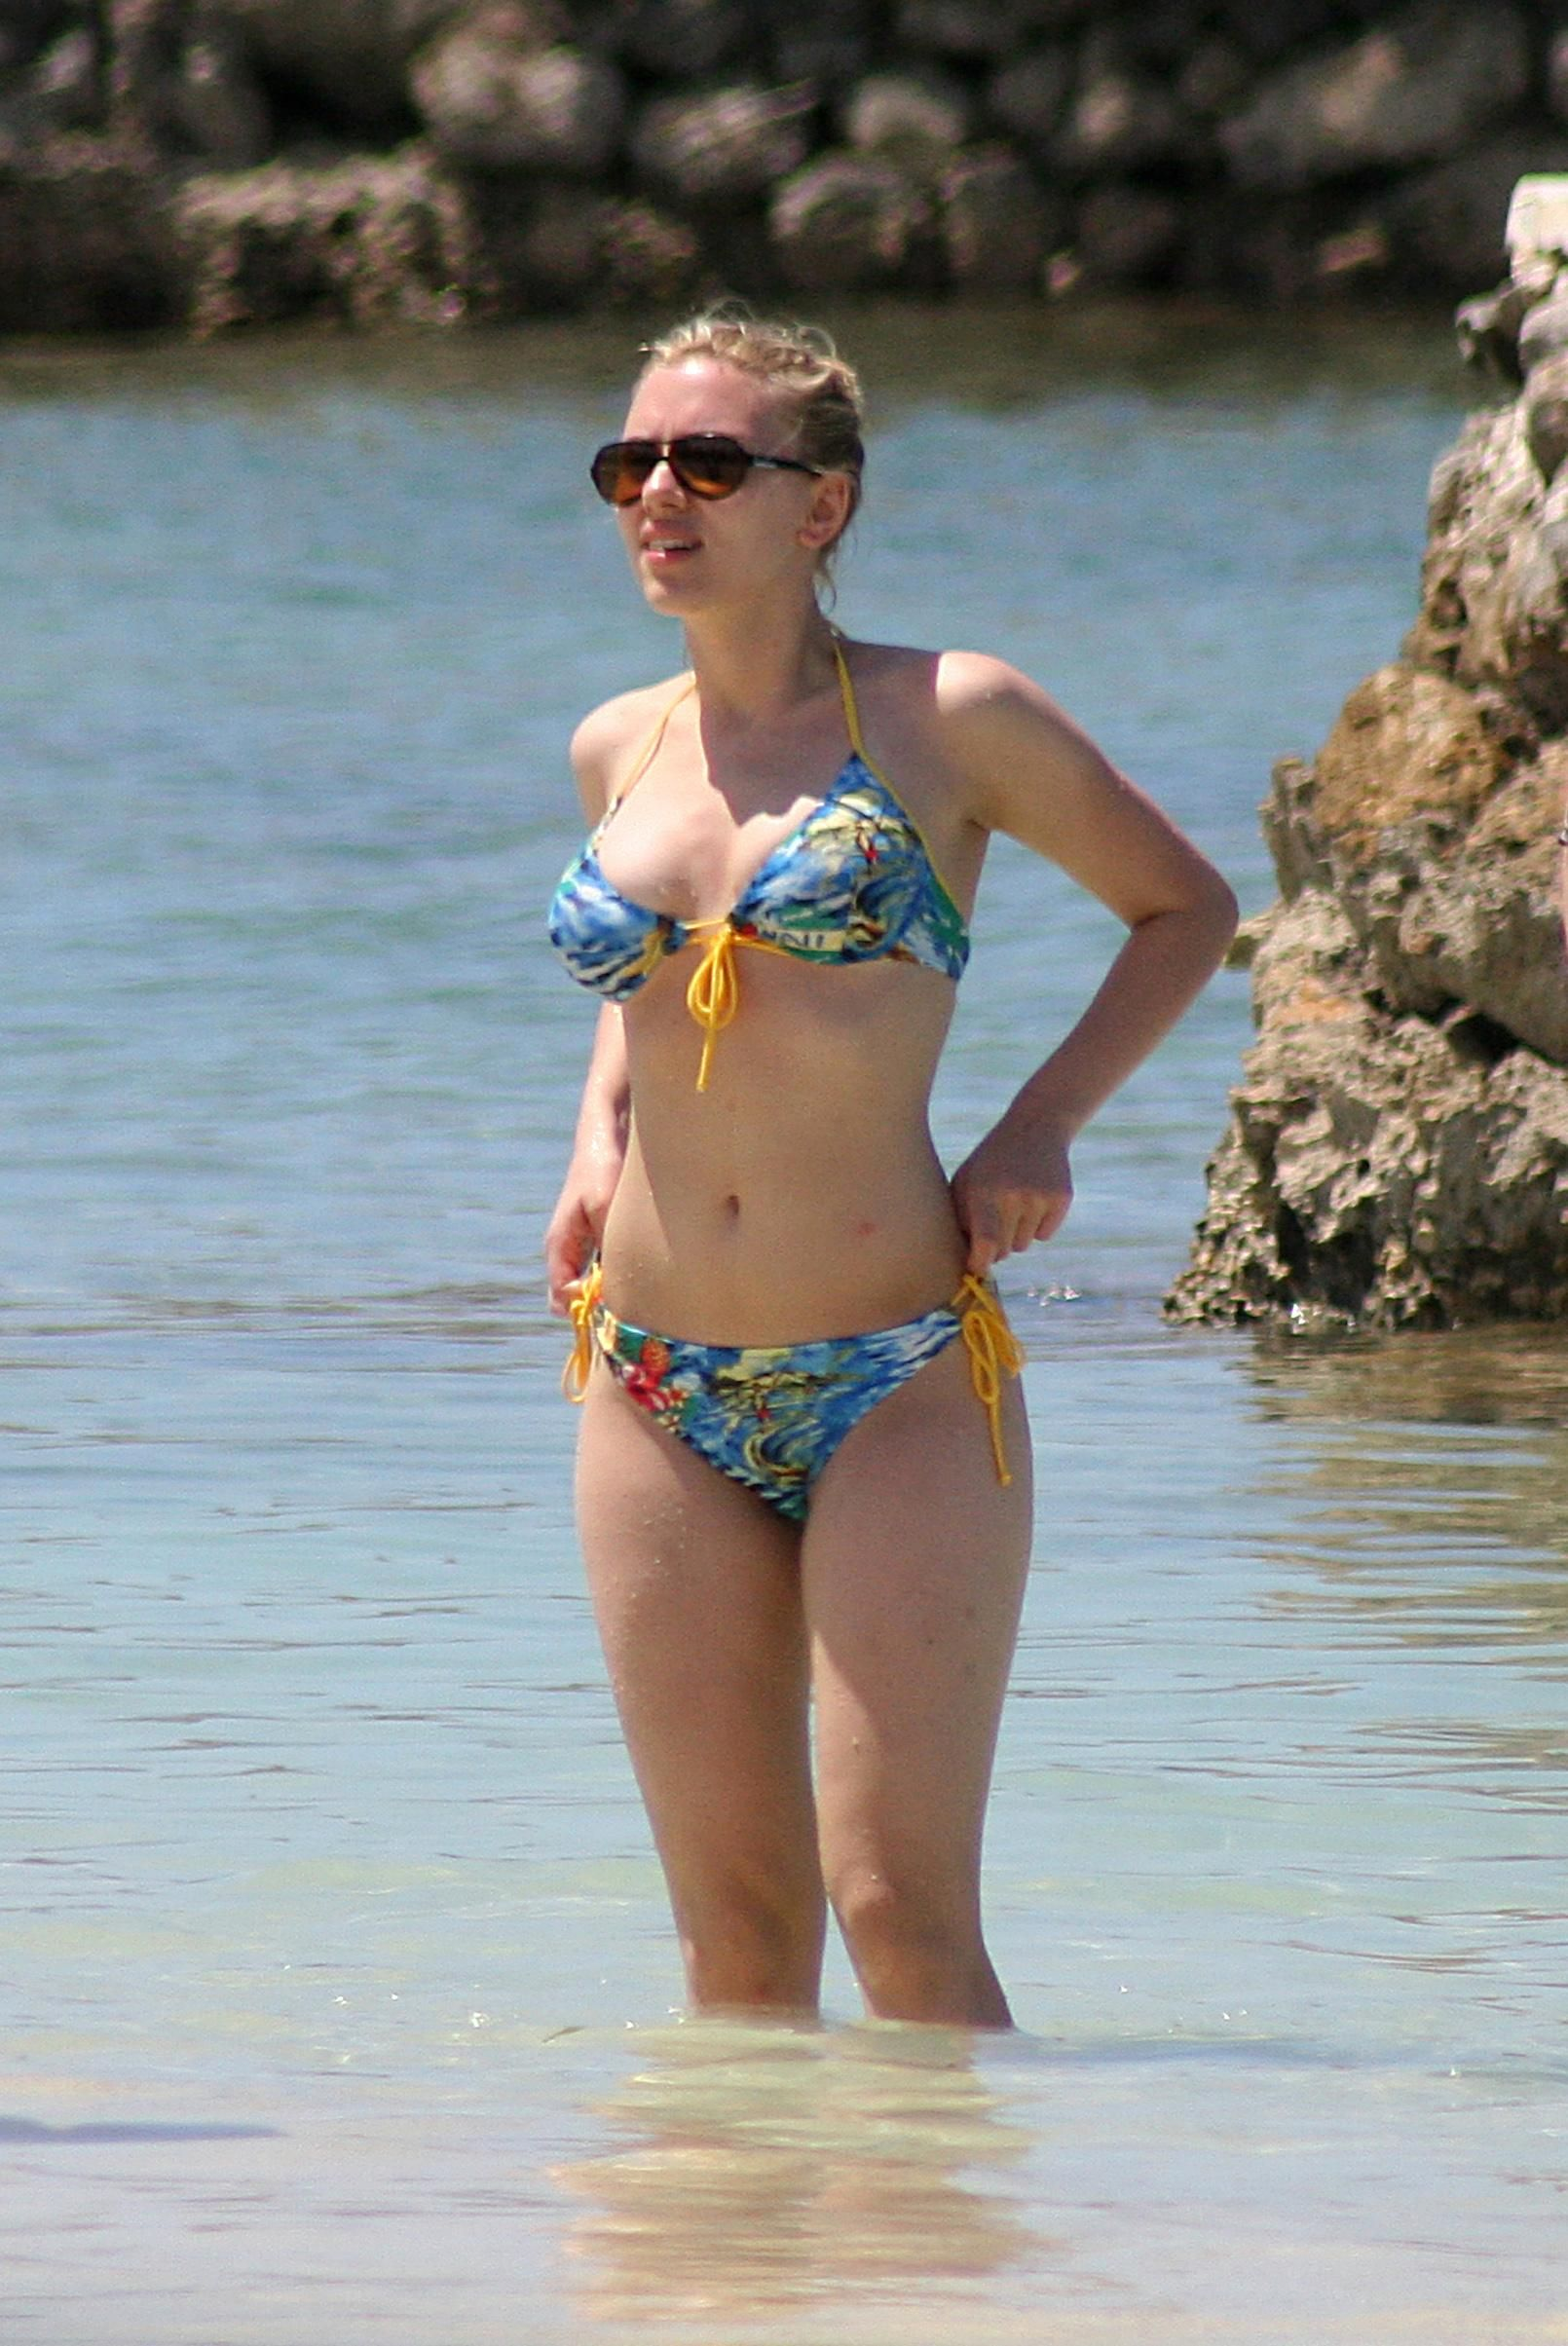 Cleavage Scarlett Byrne nudes (55 photo), Sexy, Bikini, Boobs, cameltoe 2019